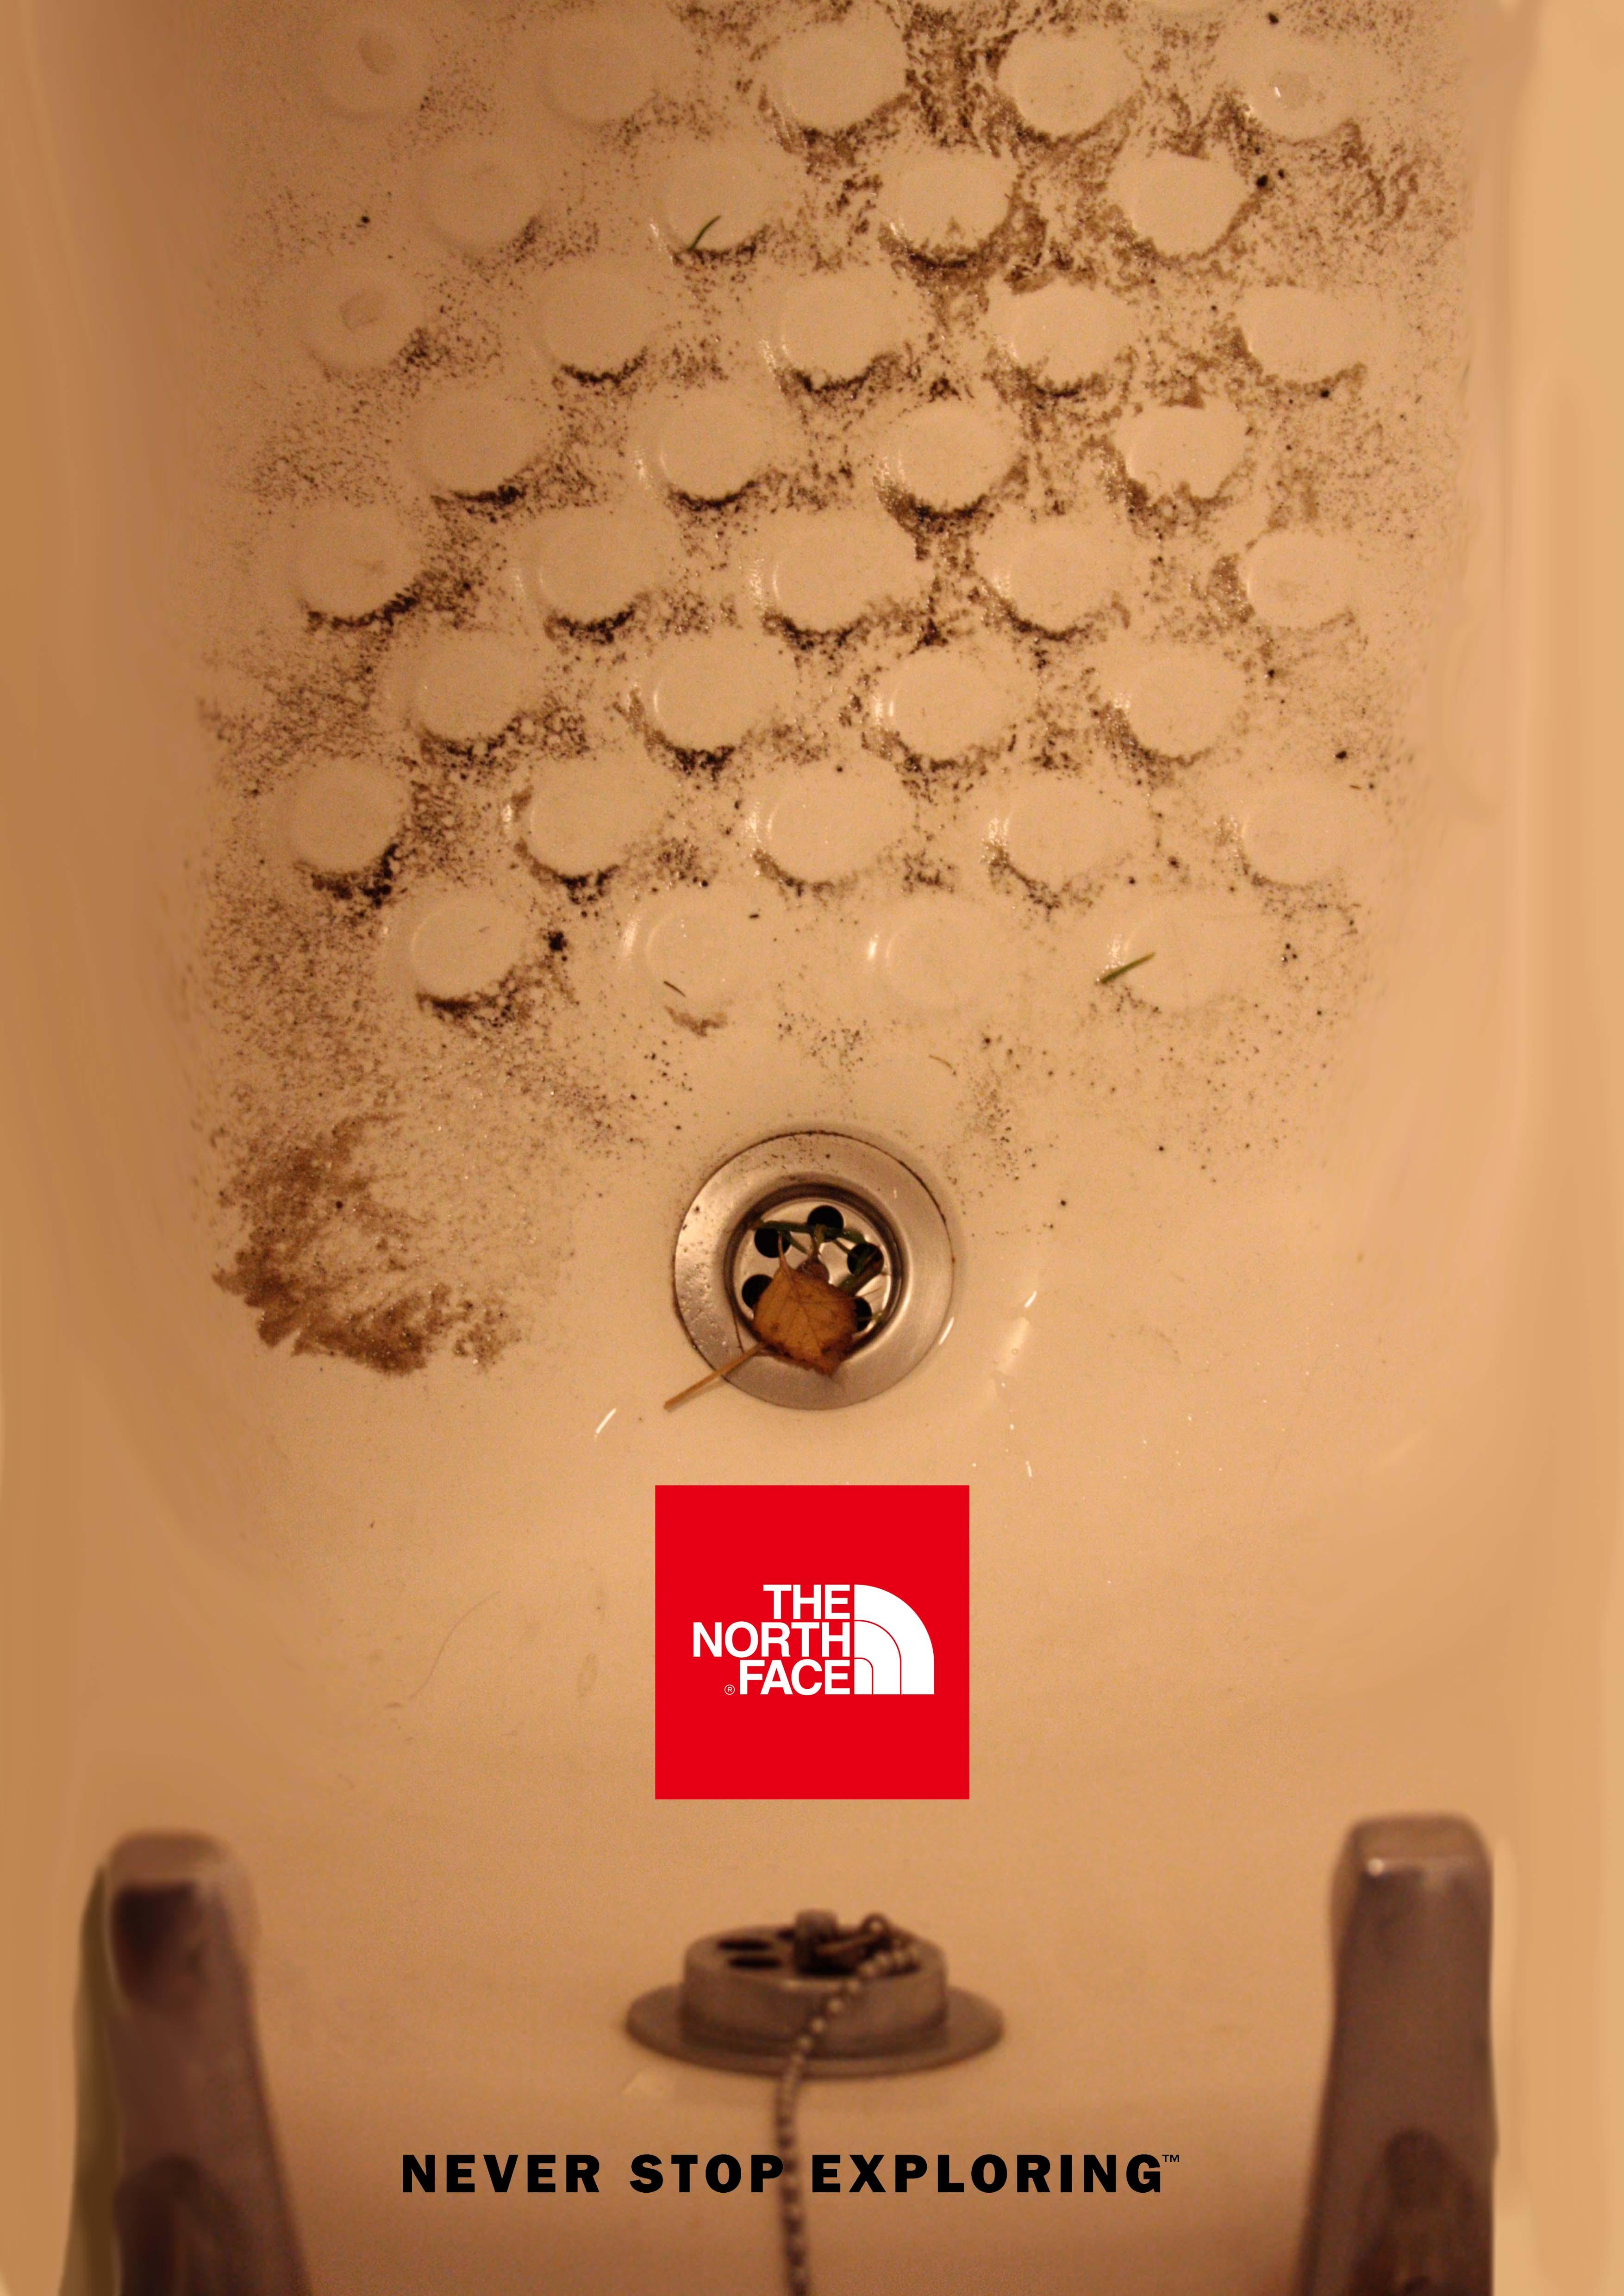 The North Face Shower Gel Poster Dfi Sanjan Sabherwal